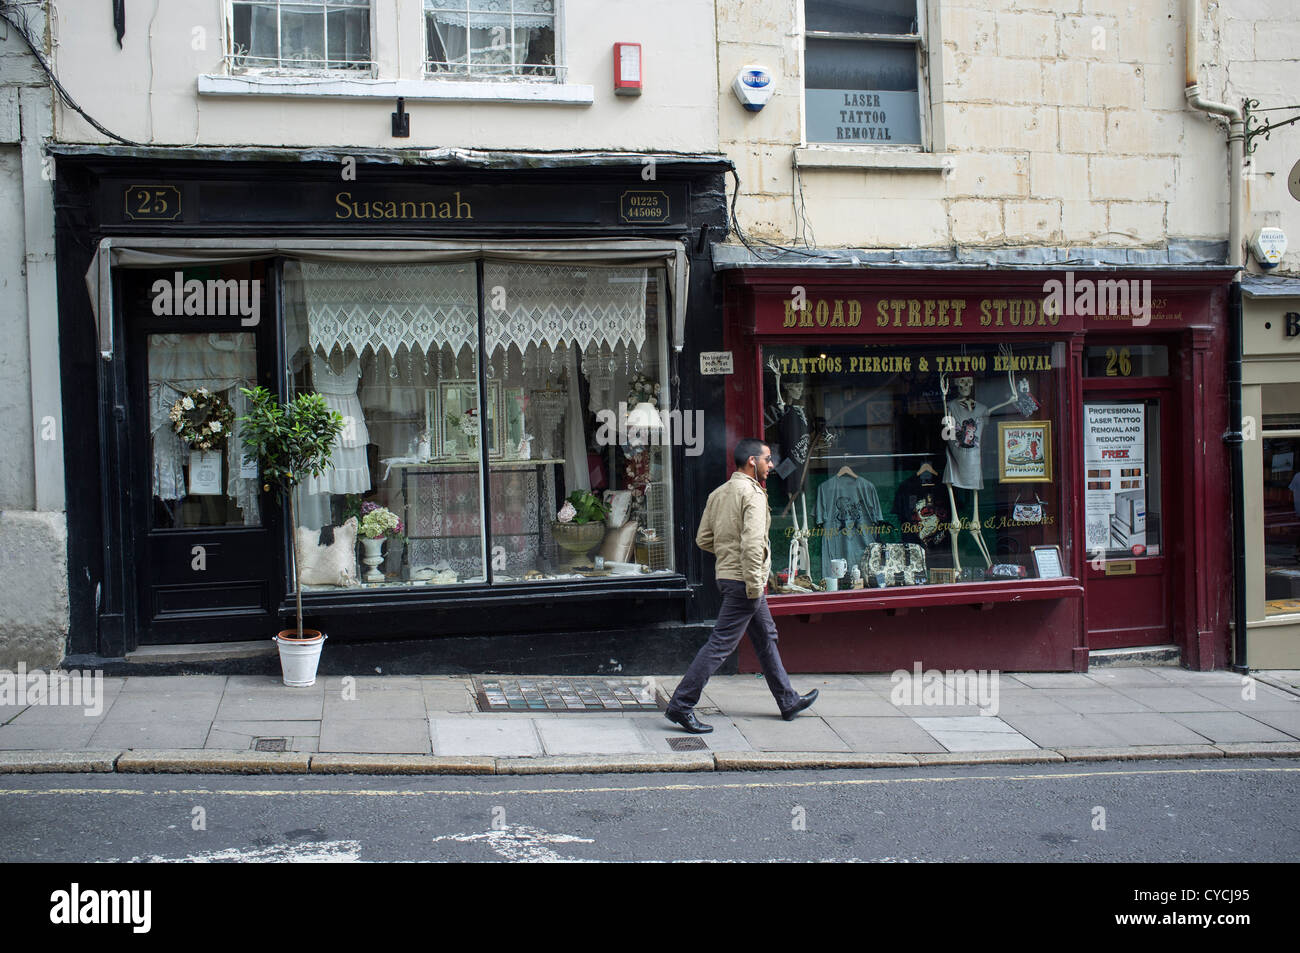 Local Shop Fronts Broad Street Bradford on Avon - Stock Image